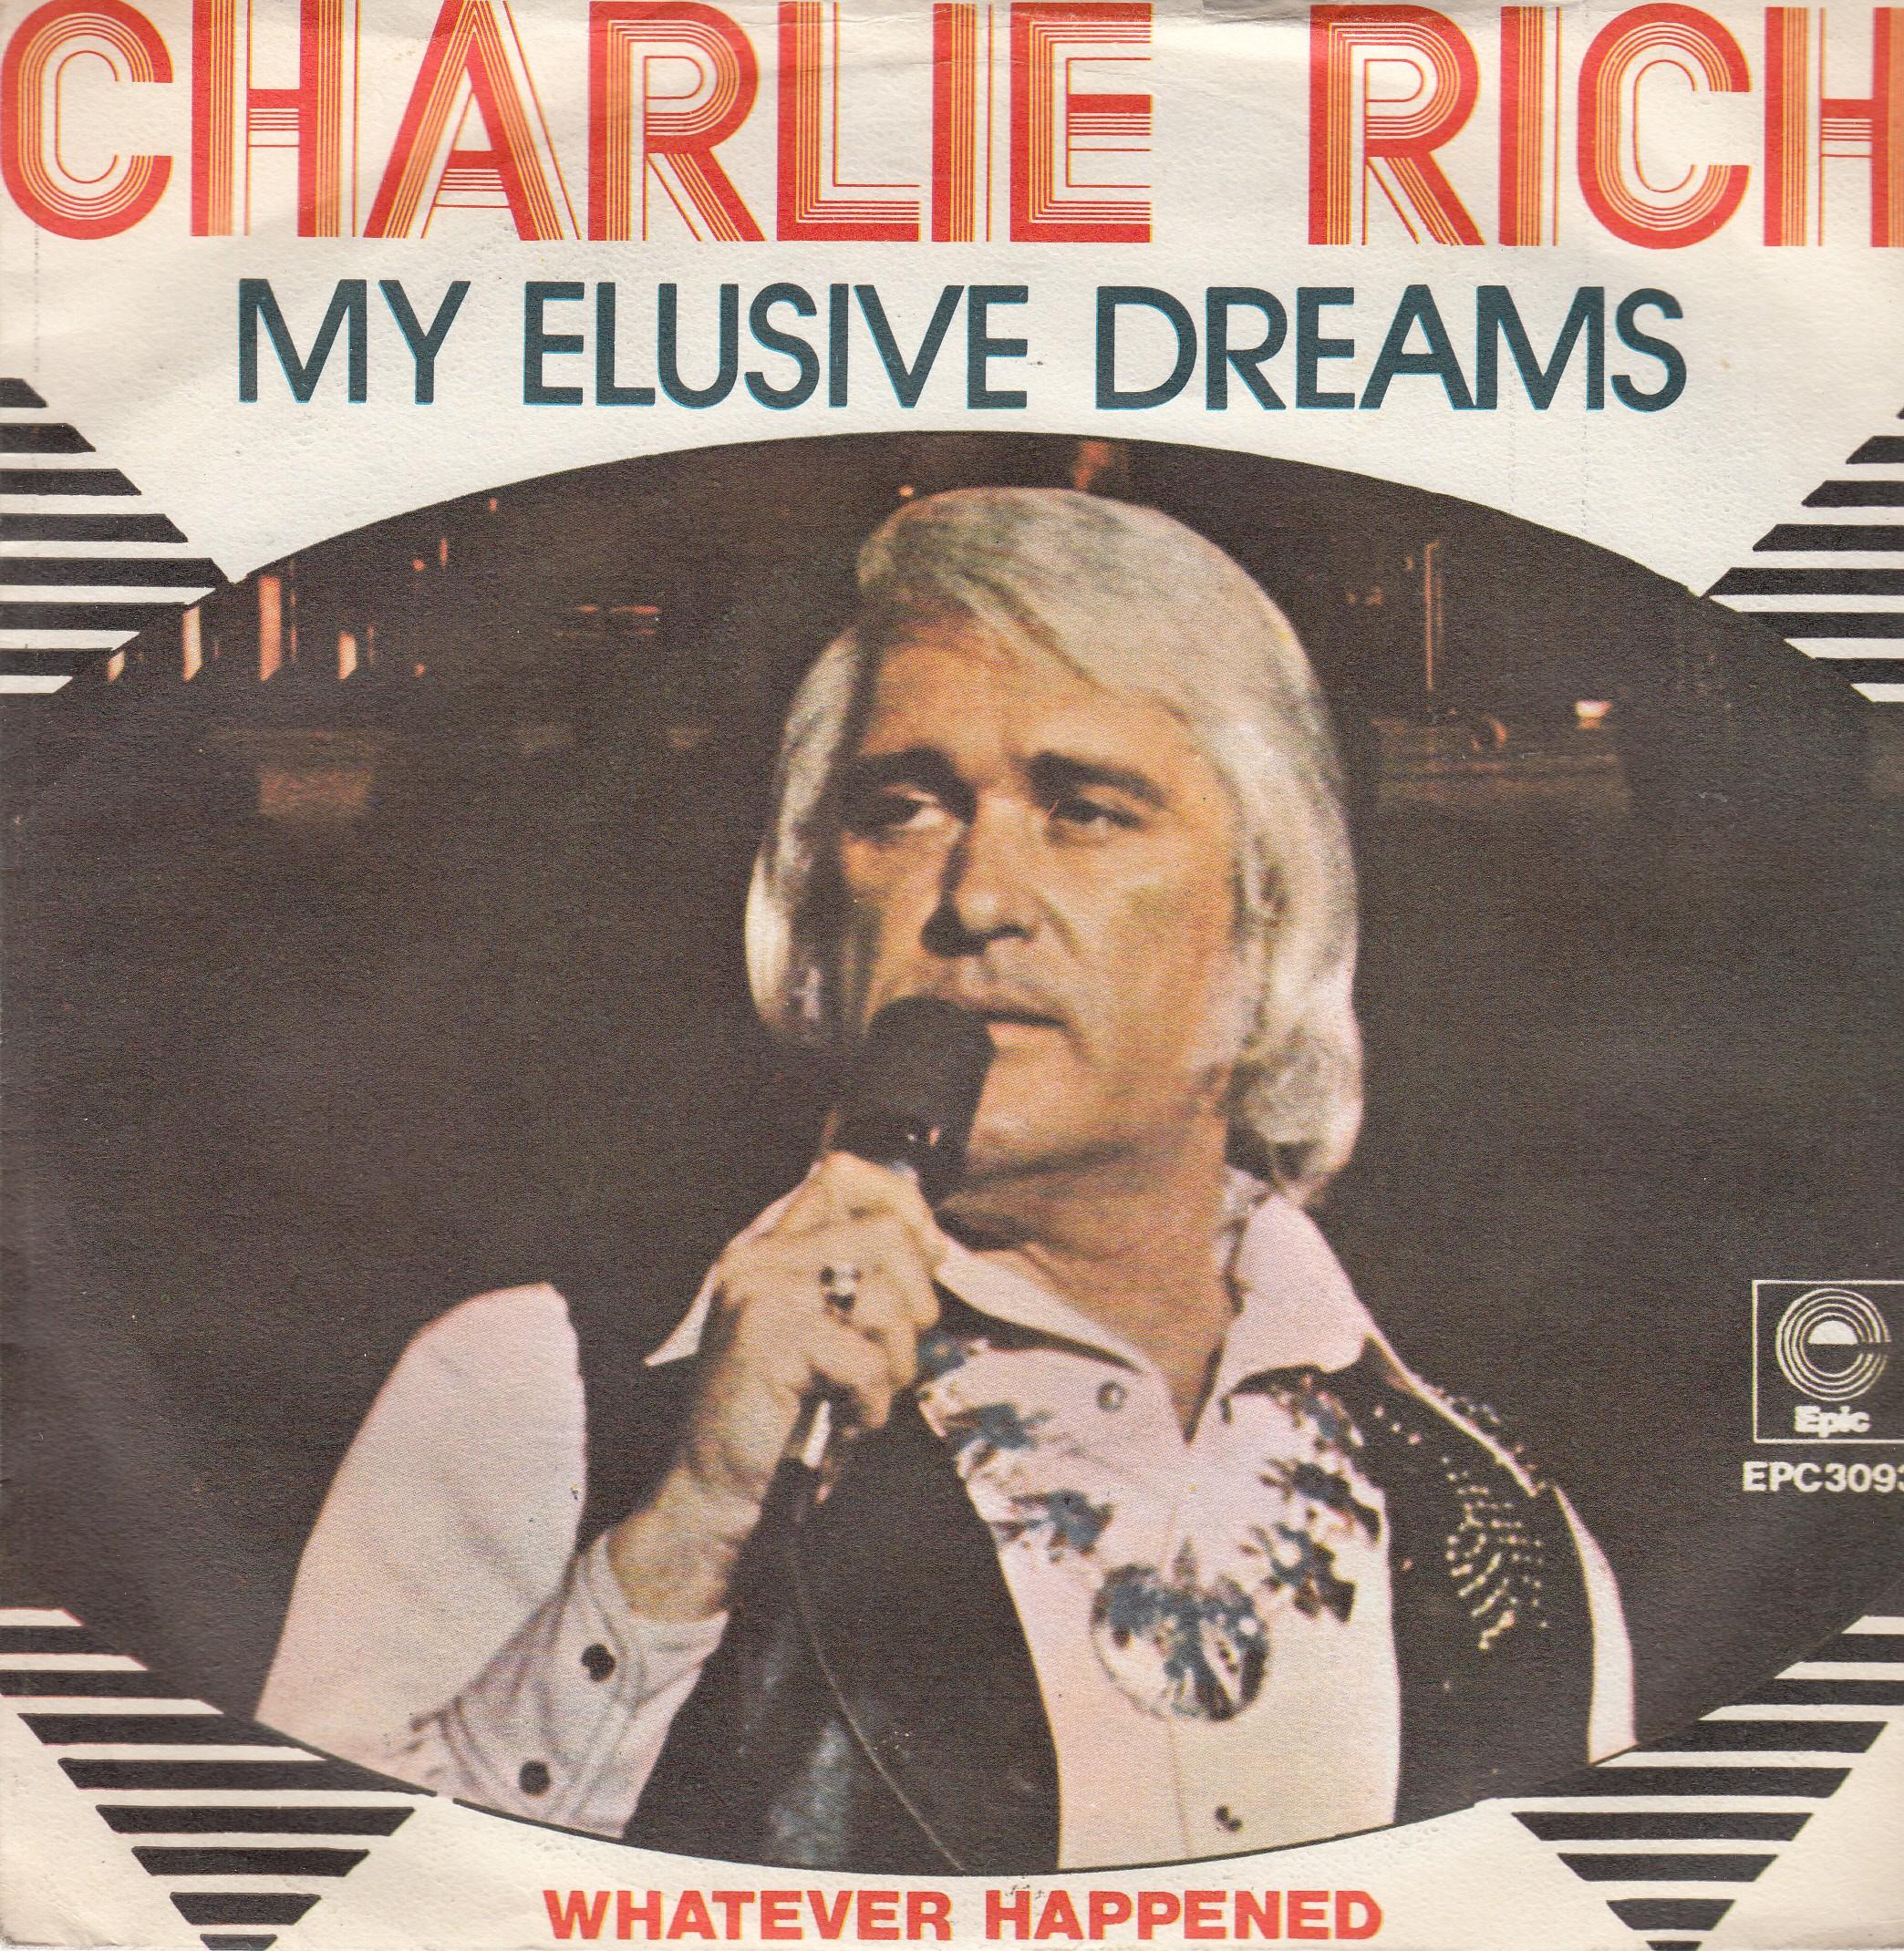 Rich Charlie - My Elusive Dreams/whatever Happened